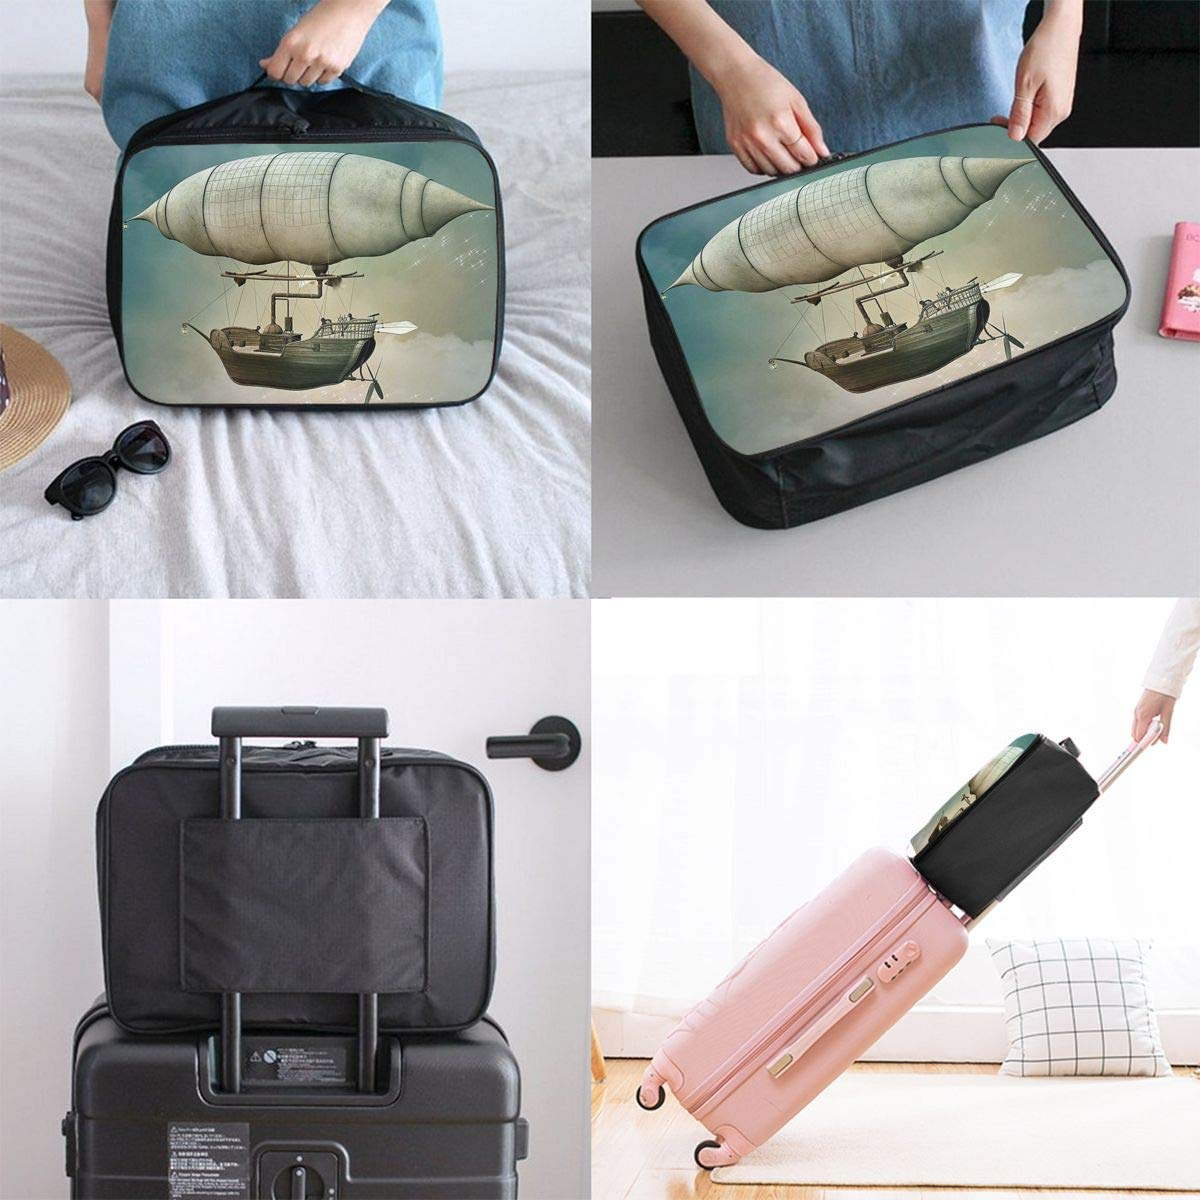 ADGAI Steampunk Airship Fantasy2 Canvas Travel Weekender Bag,Fashion Custom Lightweight Large Capacity Portable Luggage Bag,Suitcase Trolley Bag